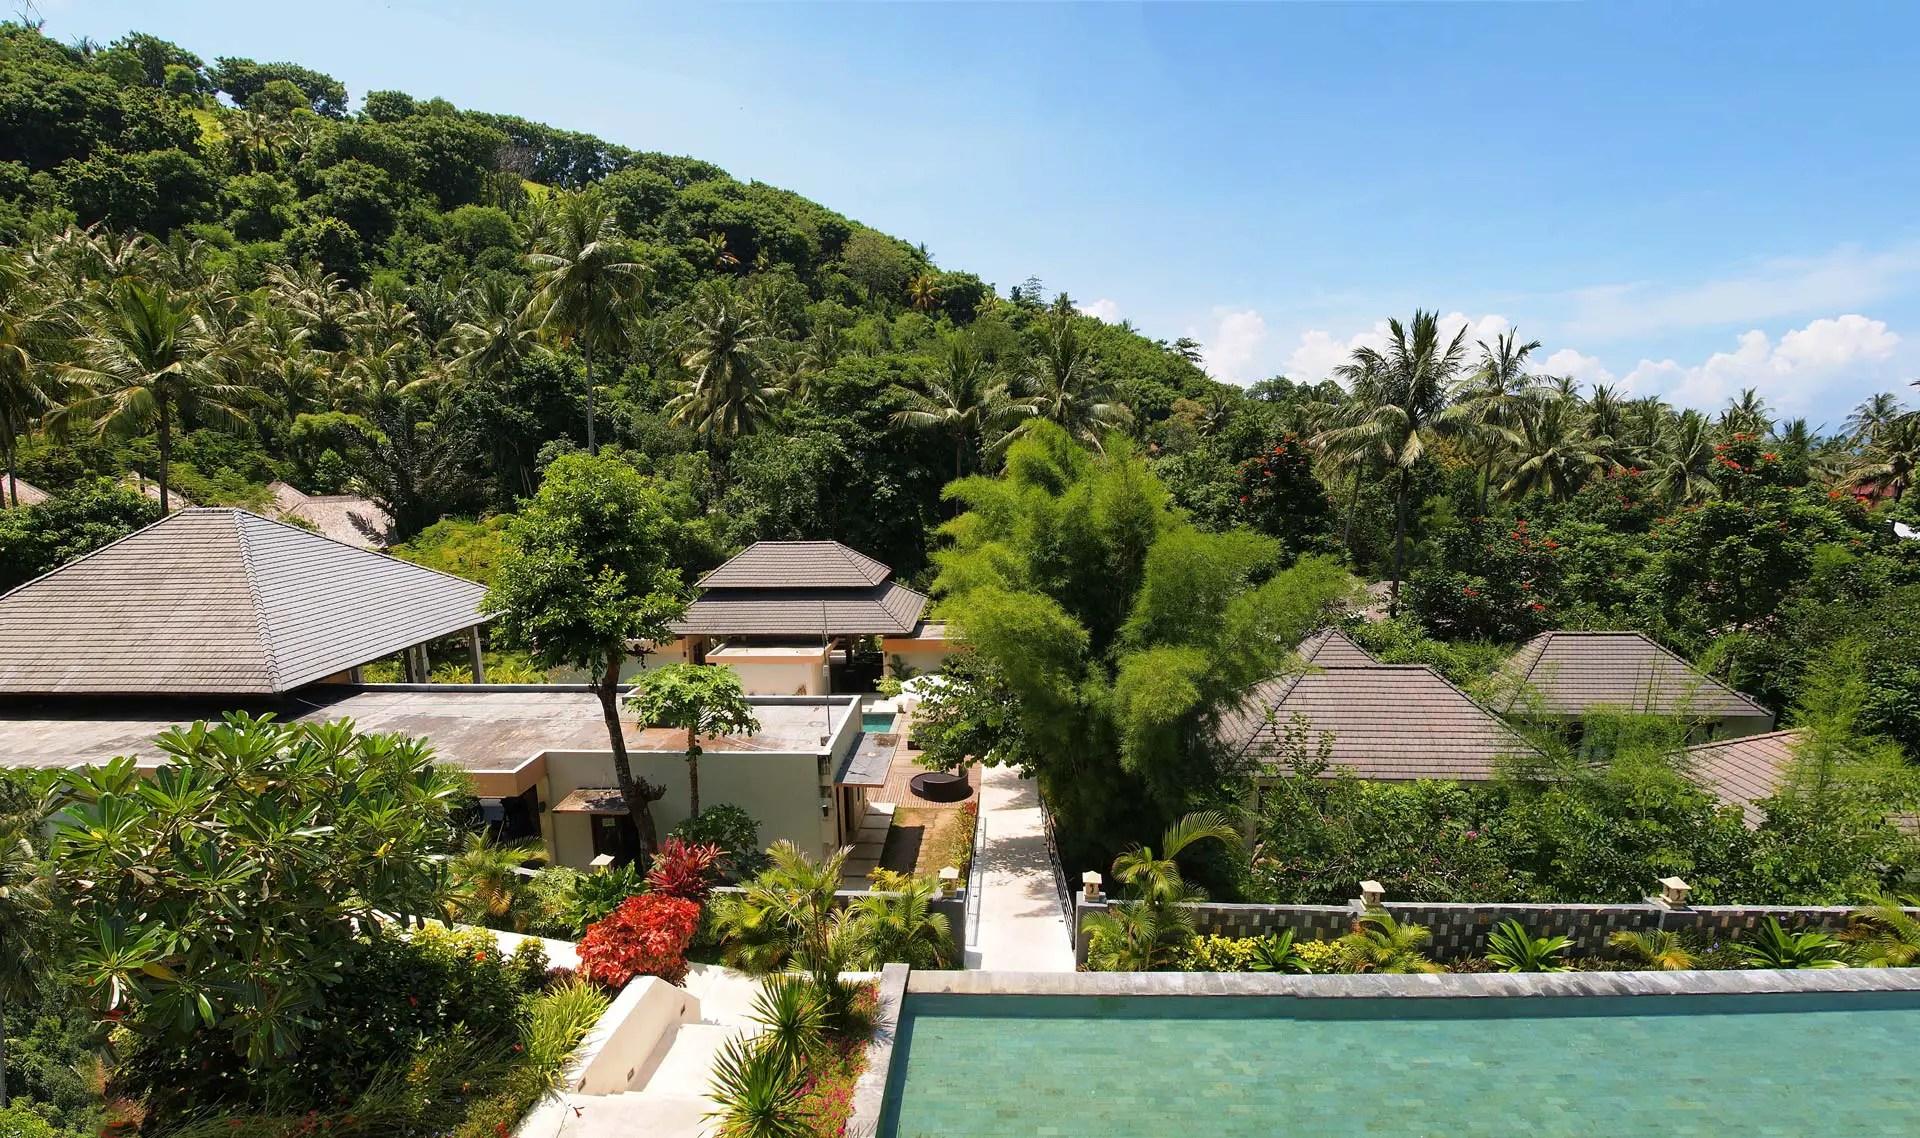 Kebun Villas Amp Resort Senggigi Lombok Travel Blog